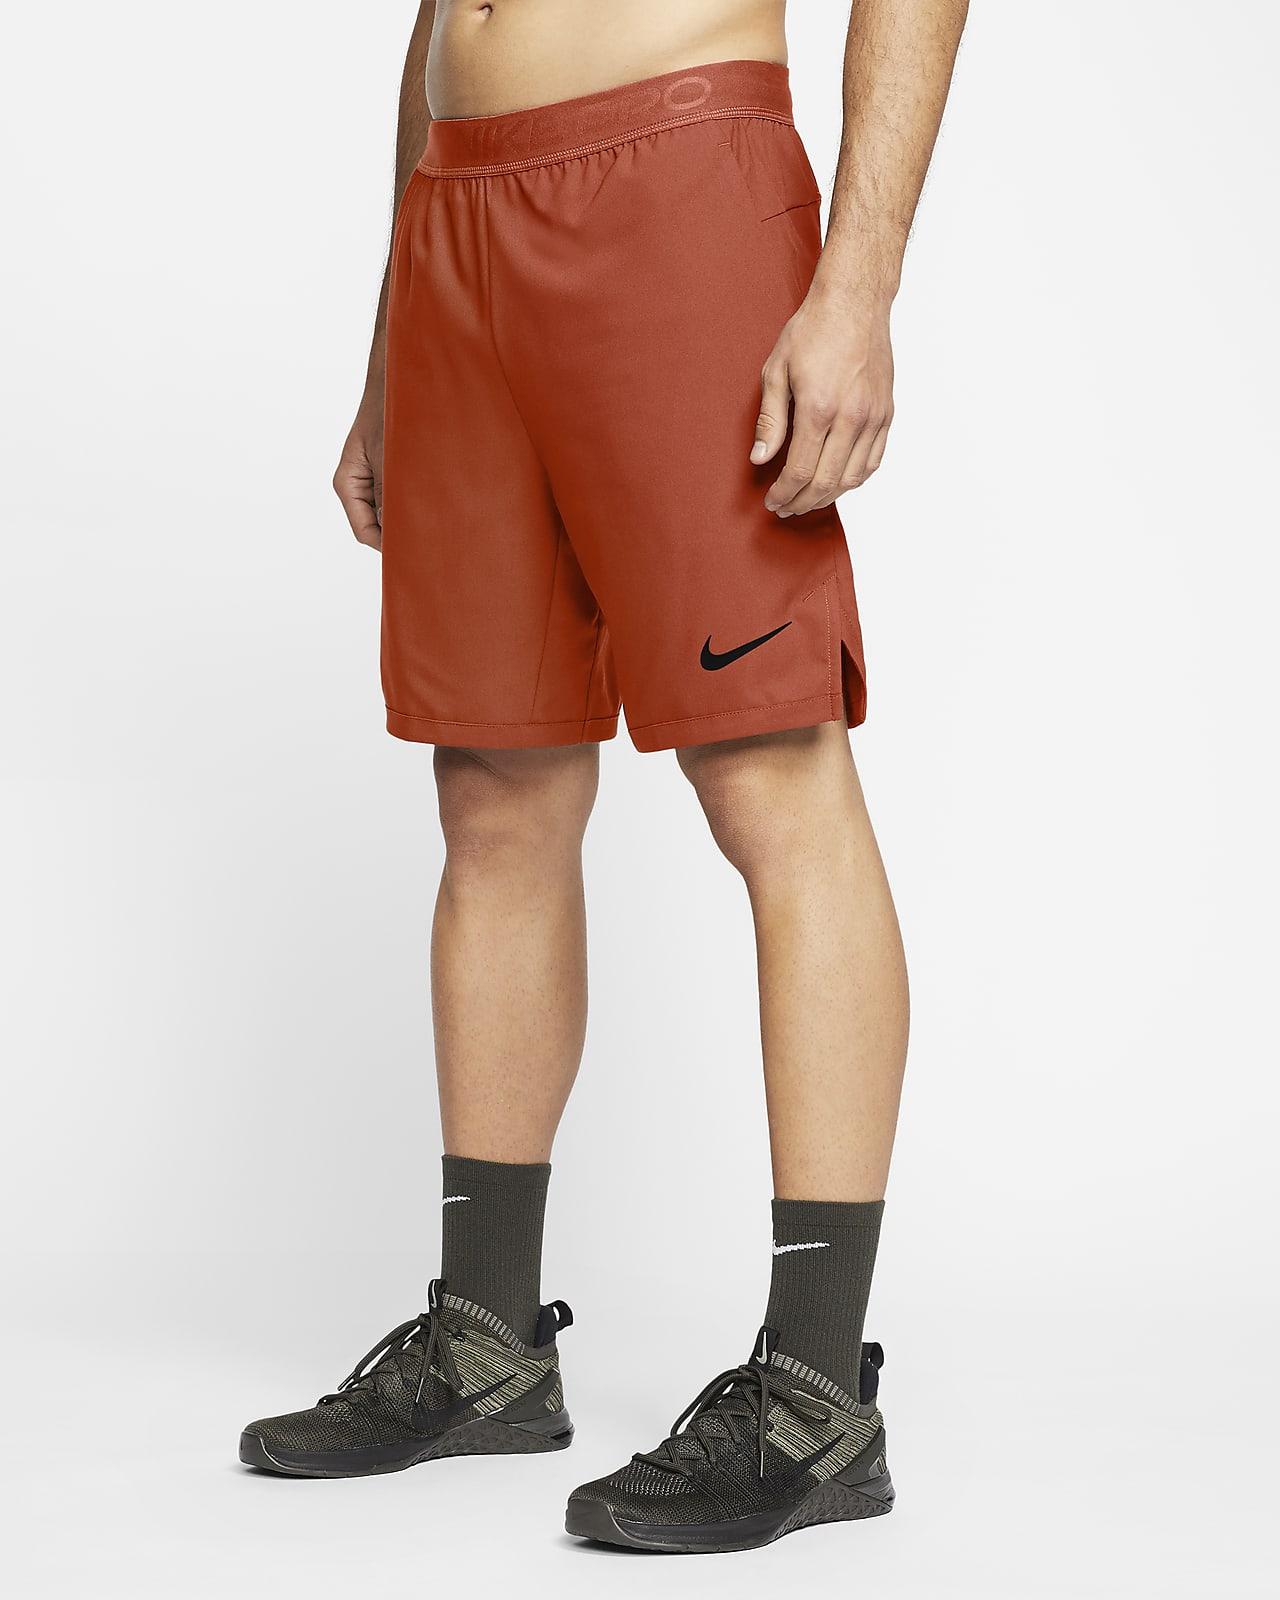 Nike Pro Flex Vent Max Men's Shorts